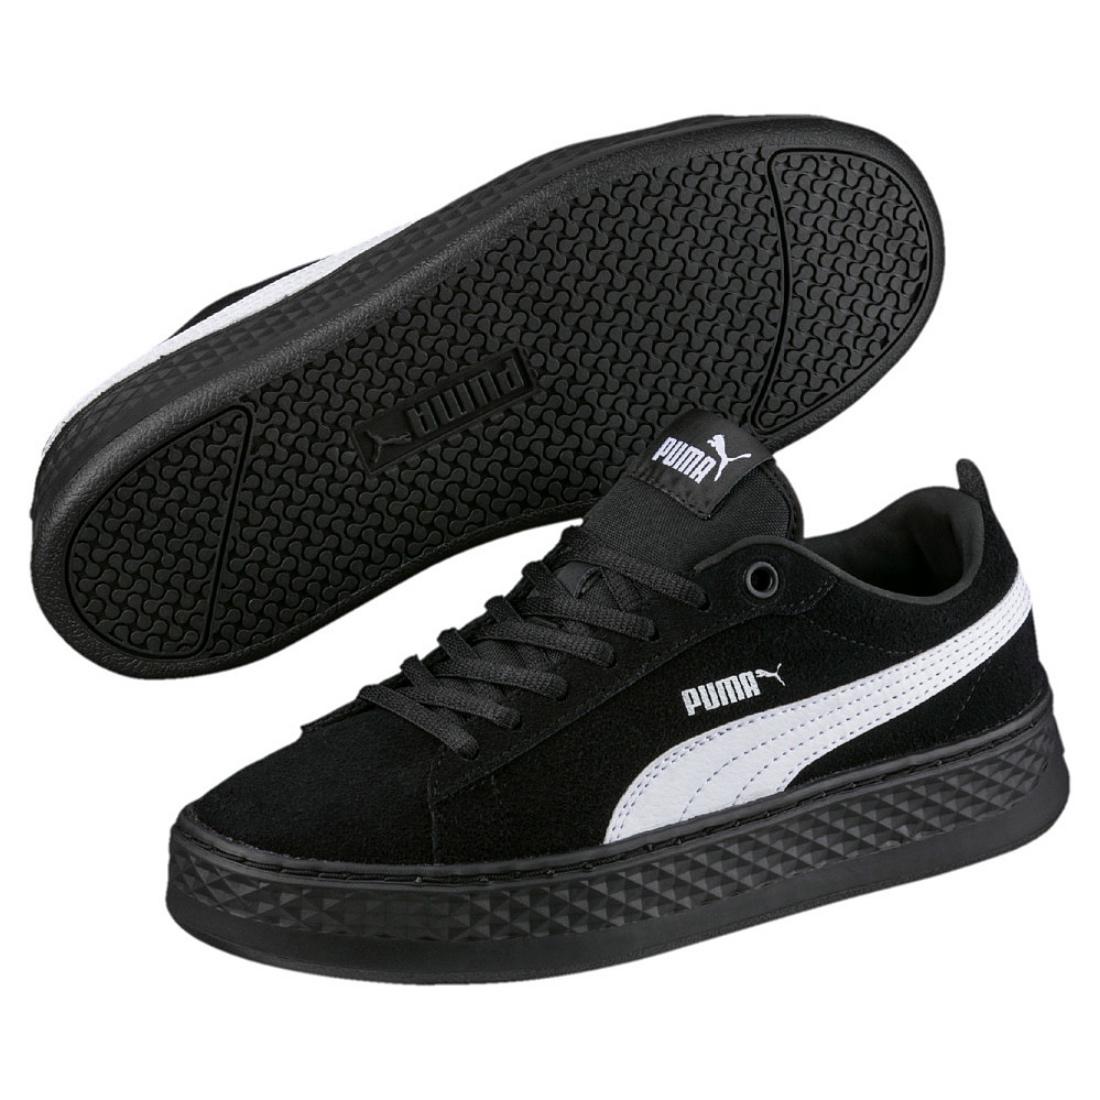 Details about Puma Smash Platform SD Ladies Sneaker Shoes 366488 Offer